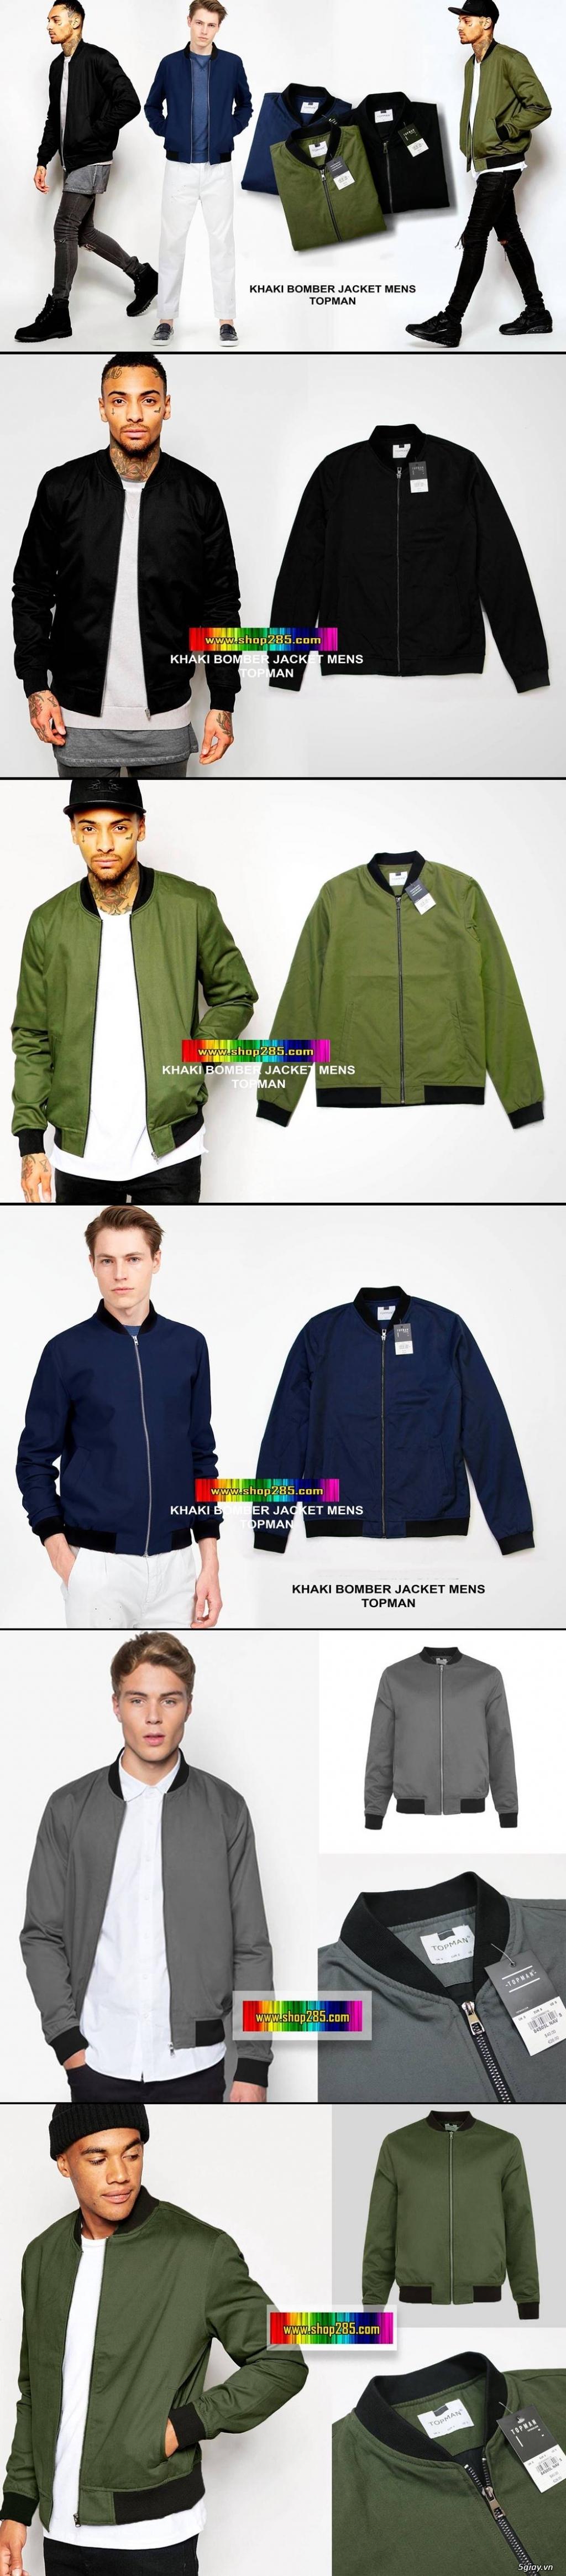 Shop285.com - Shop quần áo : Zara,Jules,Jake*s,,Hollister,Aber,CK,Tommy,Levis - 14